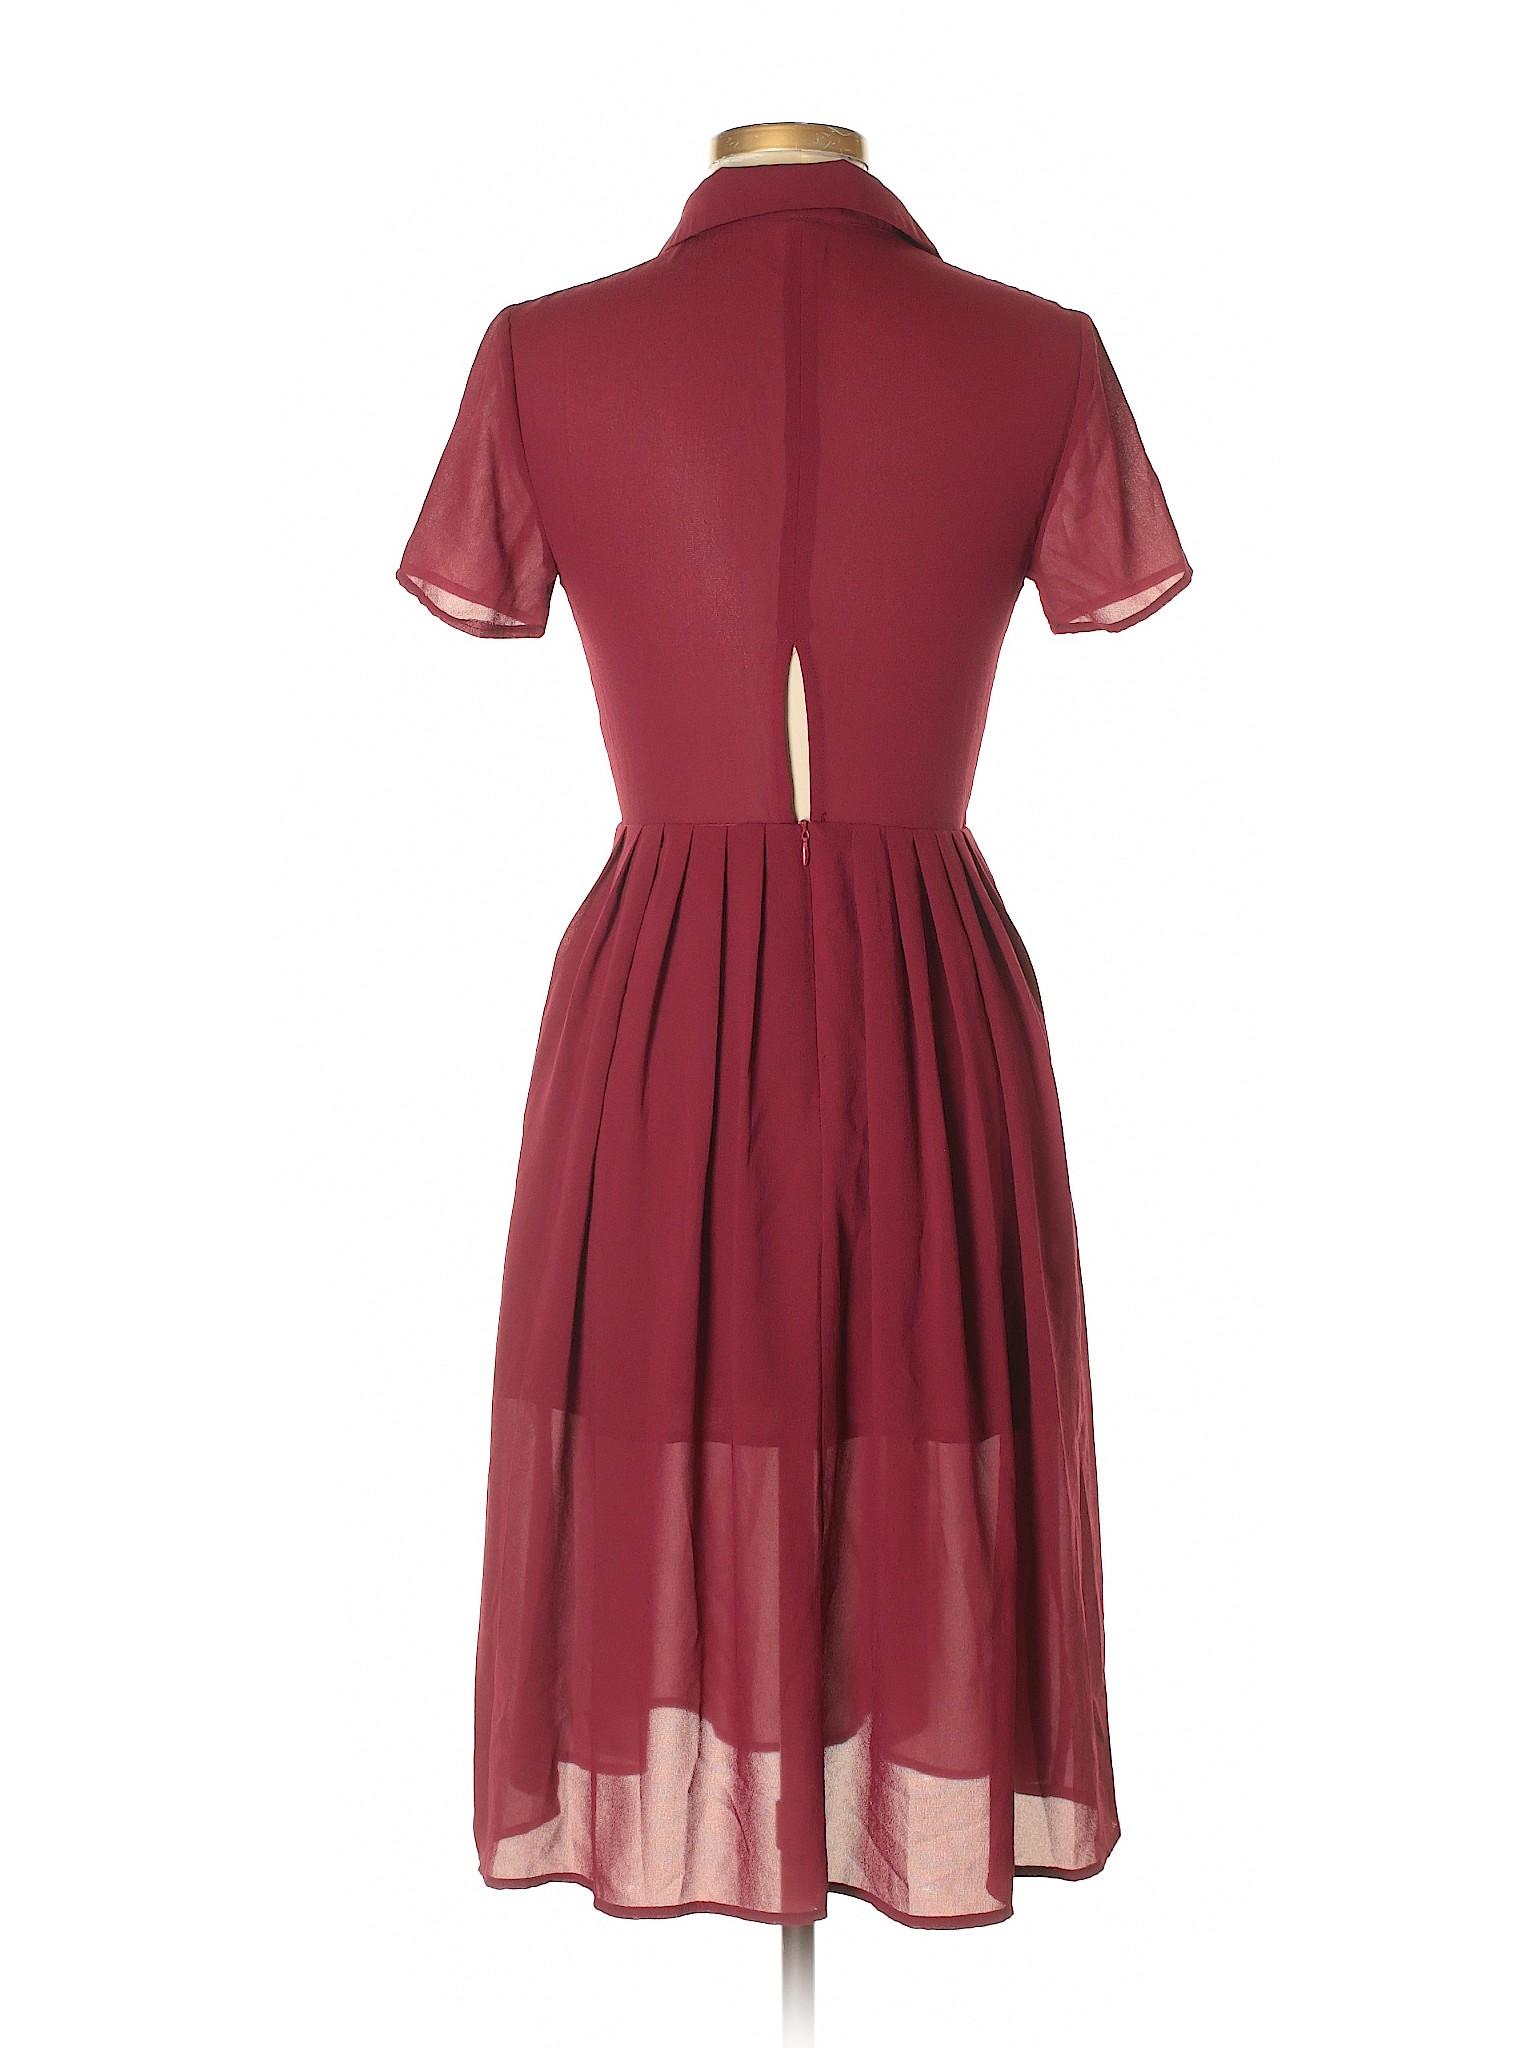 Renamed Selling Casual Dress Renamed Dress Selling Casual Selling Renamed Selling Dress Dress Casual Selling Renamed Renamed Casual O4qTpwxxv